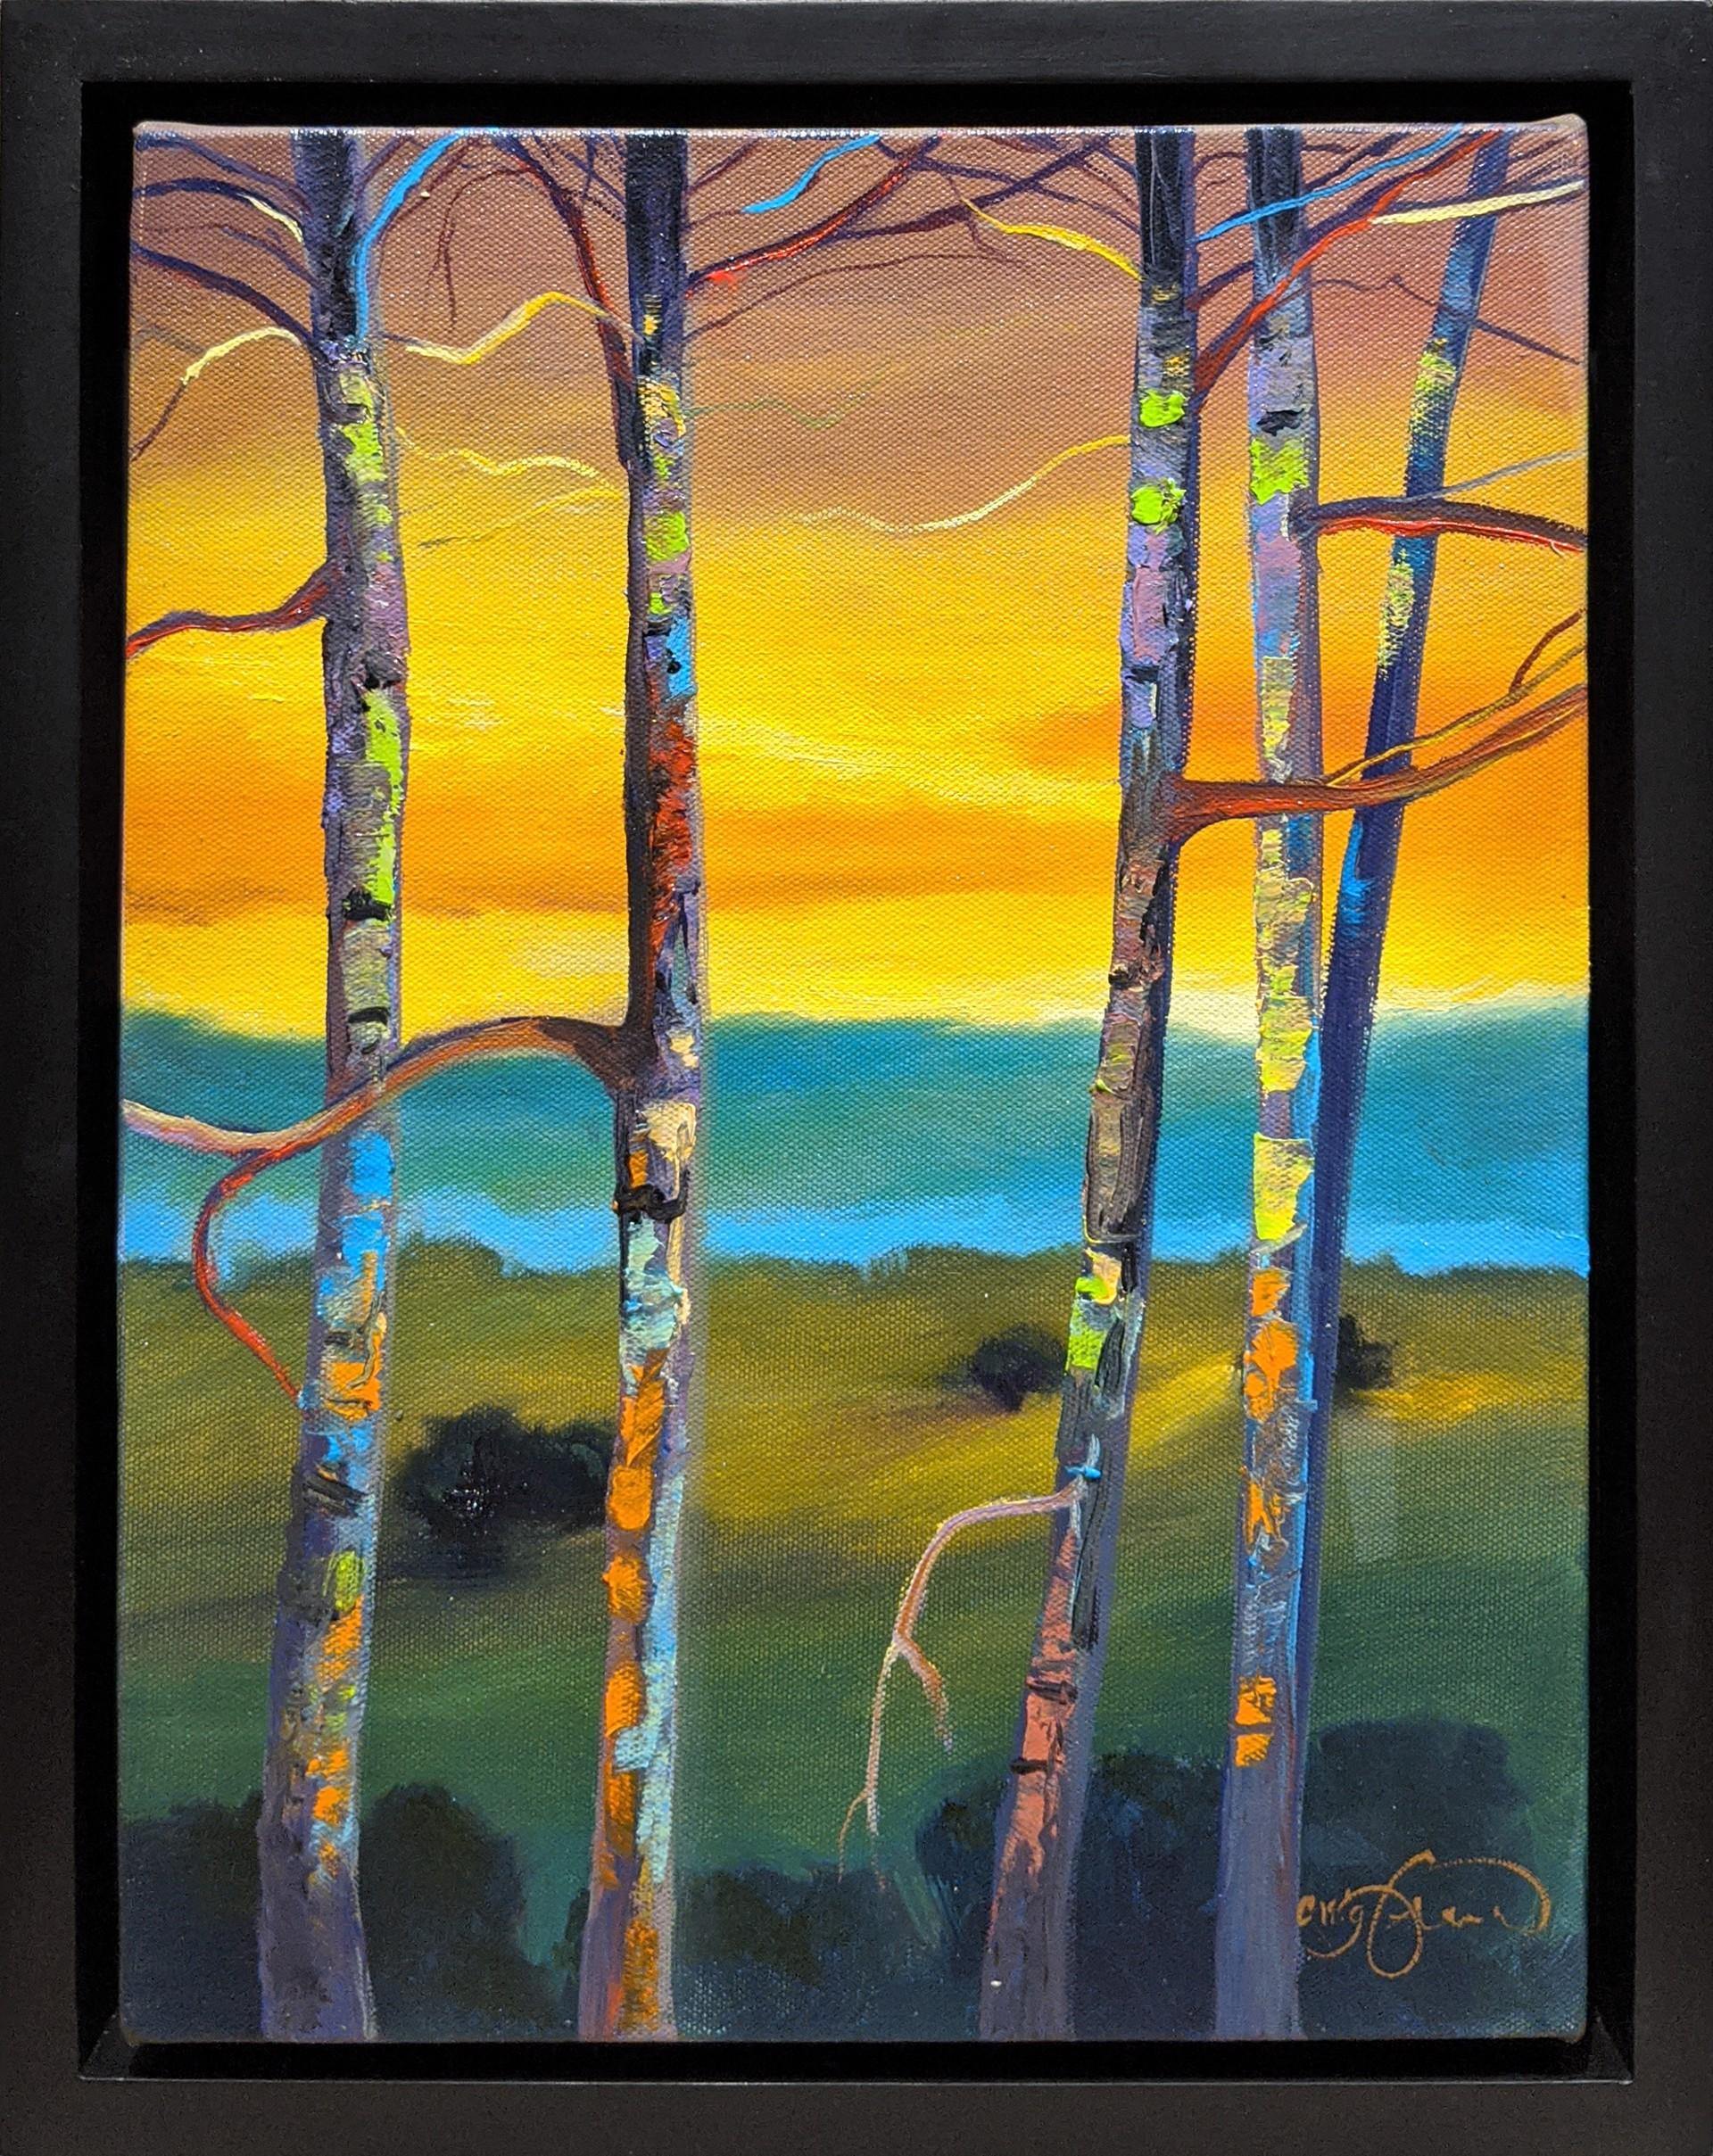 Aspen Jewel II by Craig Freeman